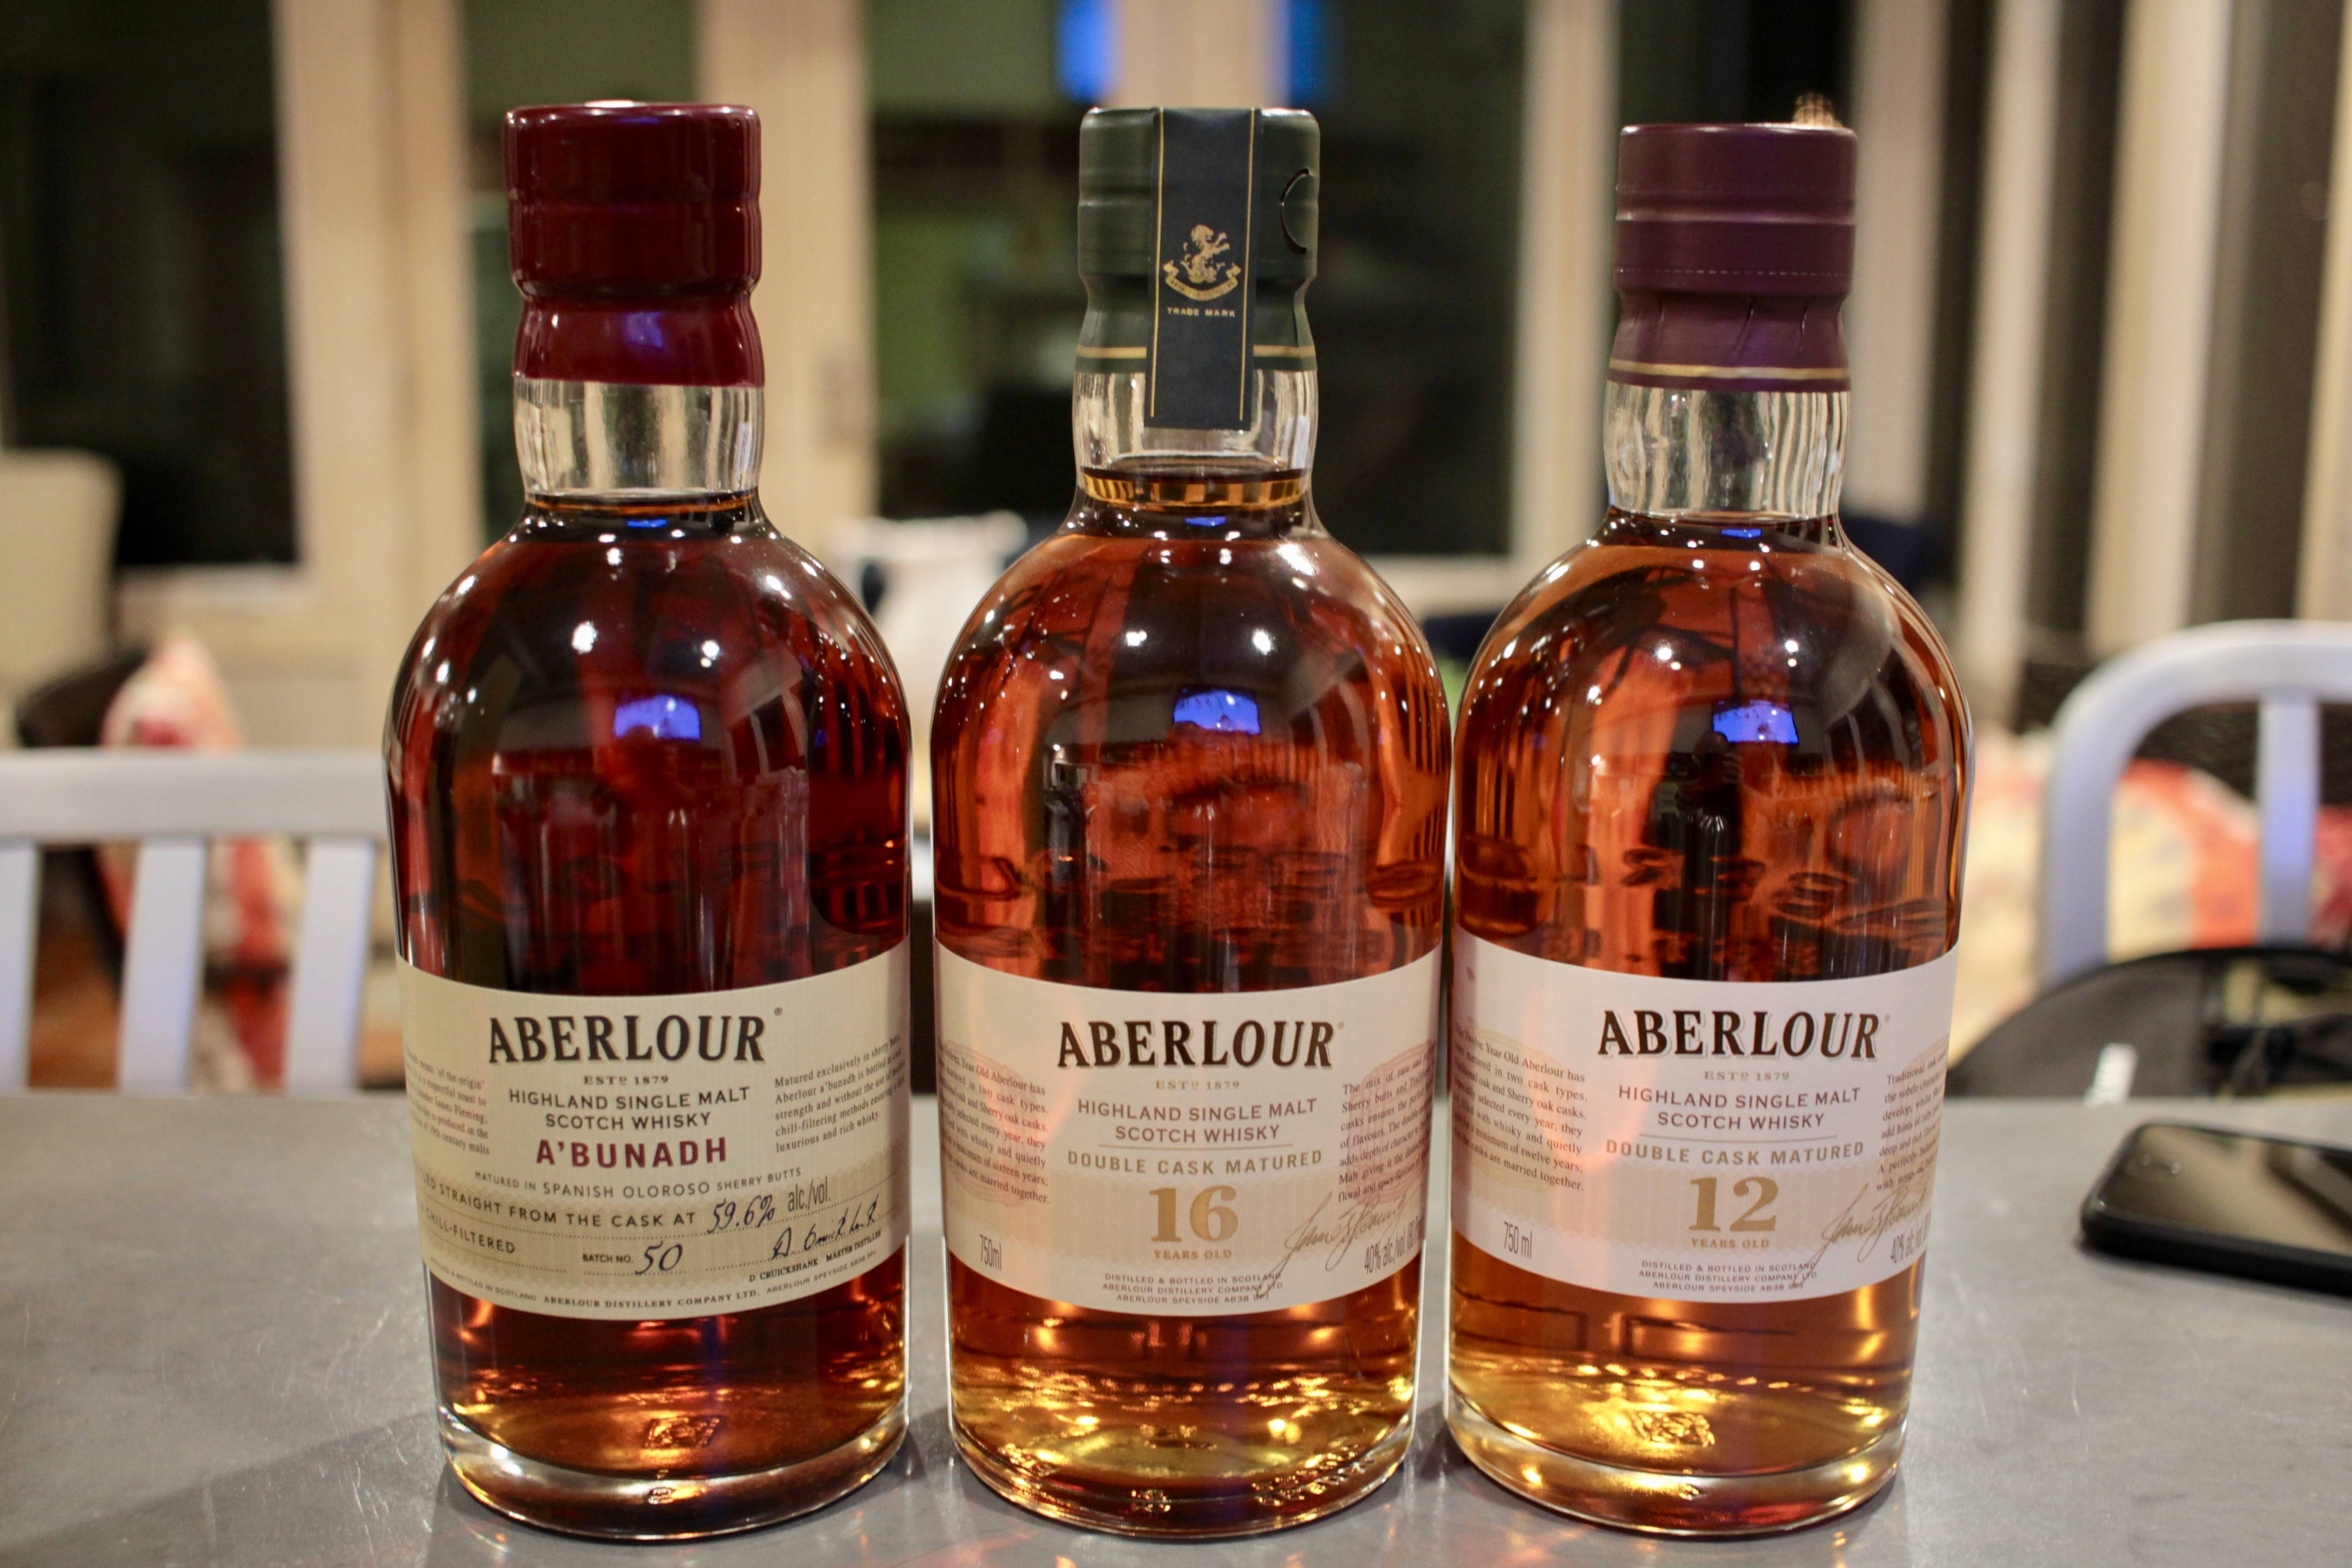 Виски aberlour 12 лет и его описание + видео | наливали